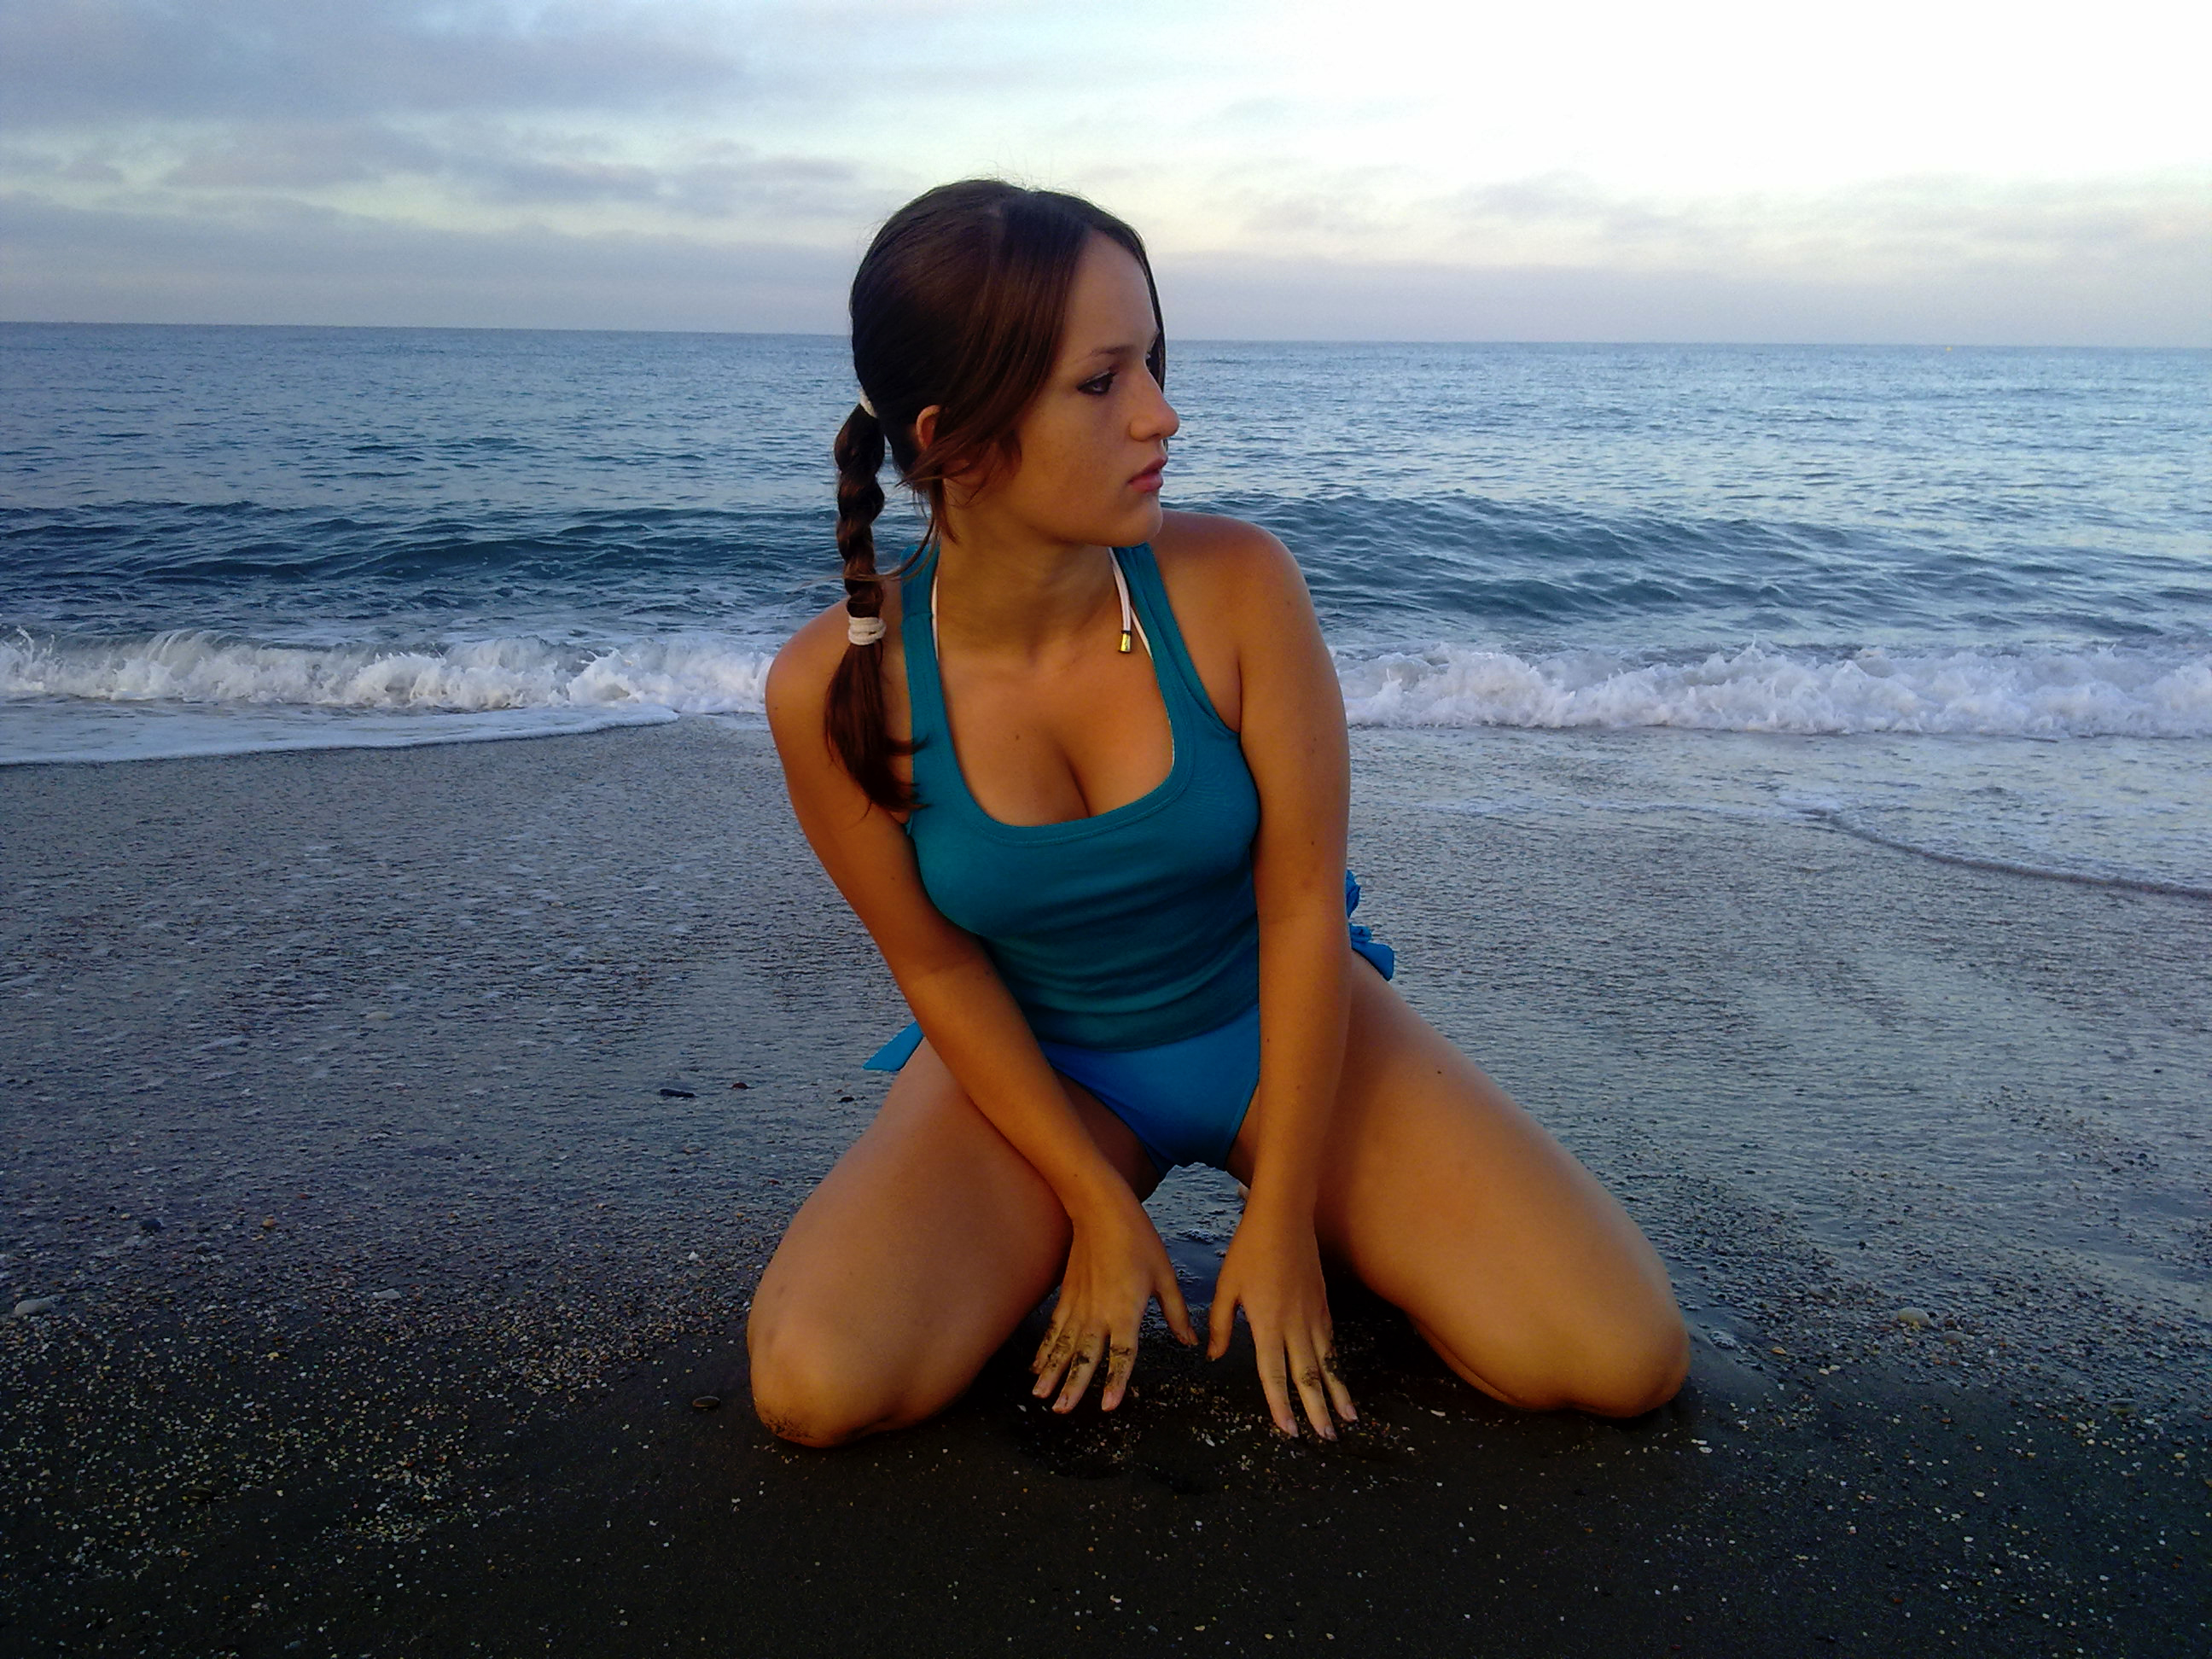 Lara Croft on the beach by Val-Raiseth